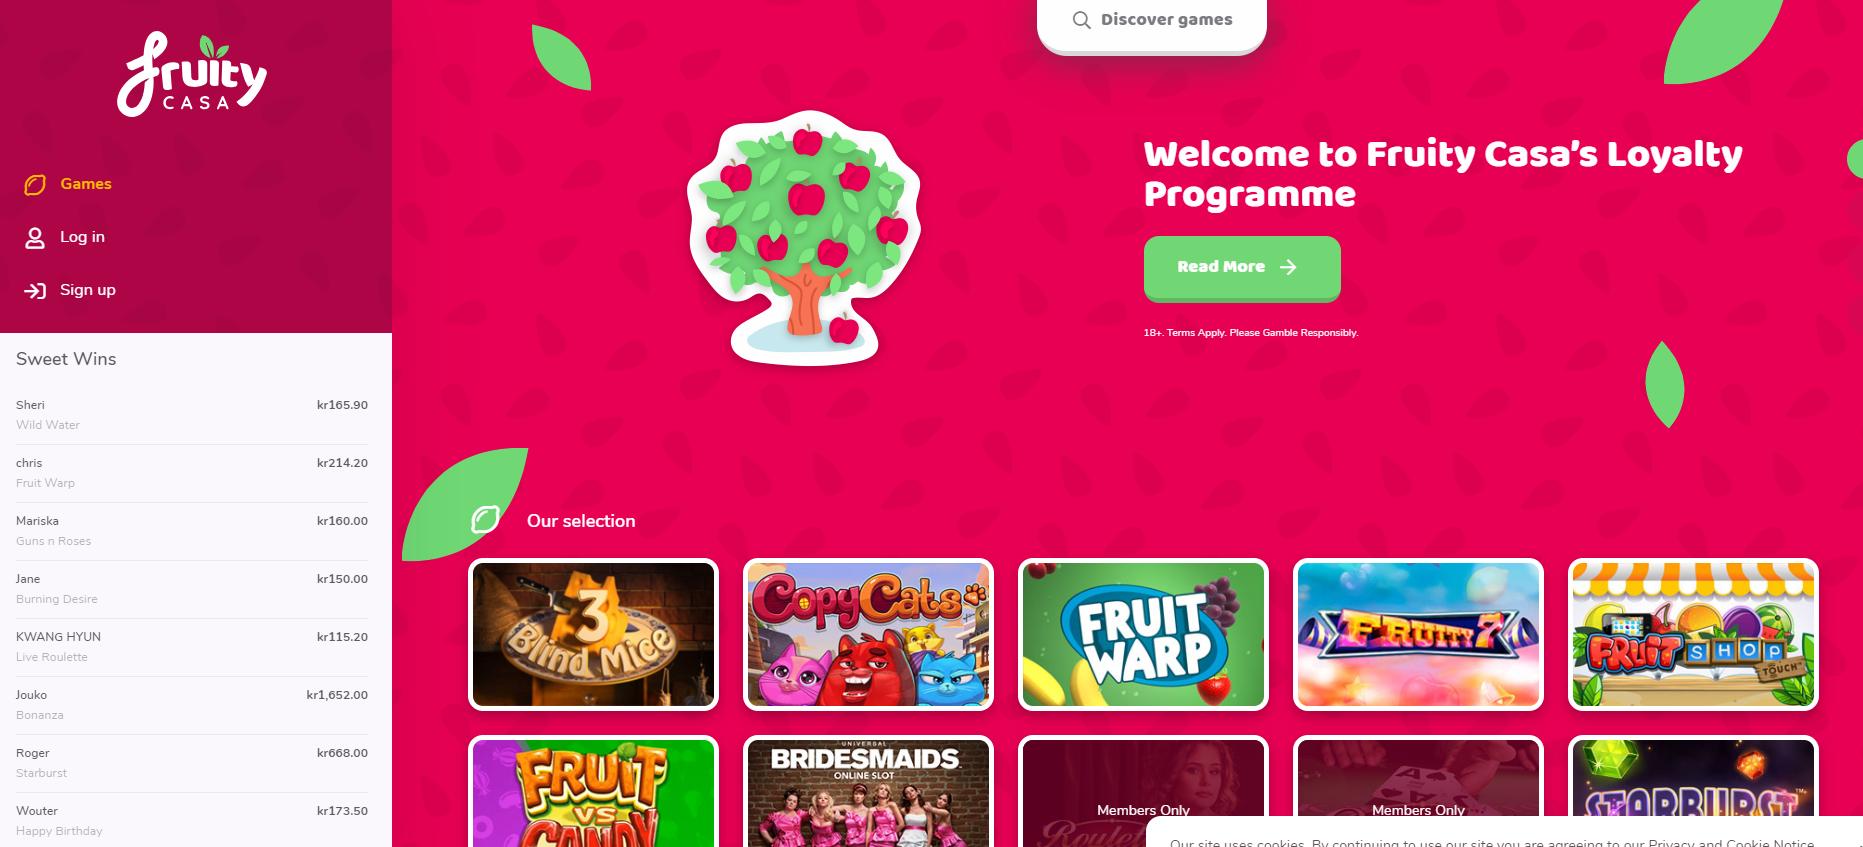 Fruit spins spelautomater - 70330